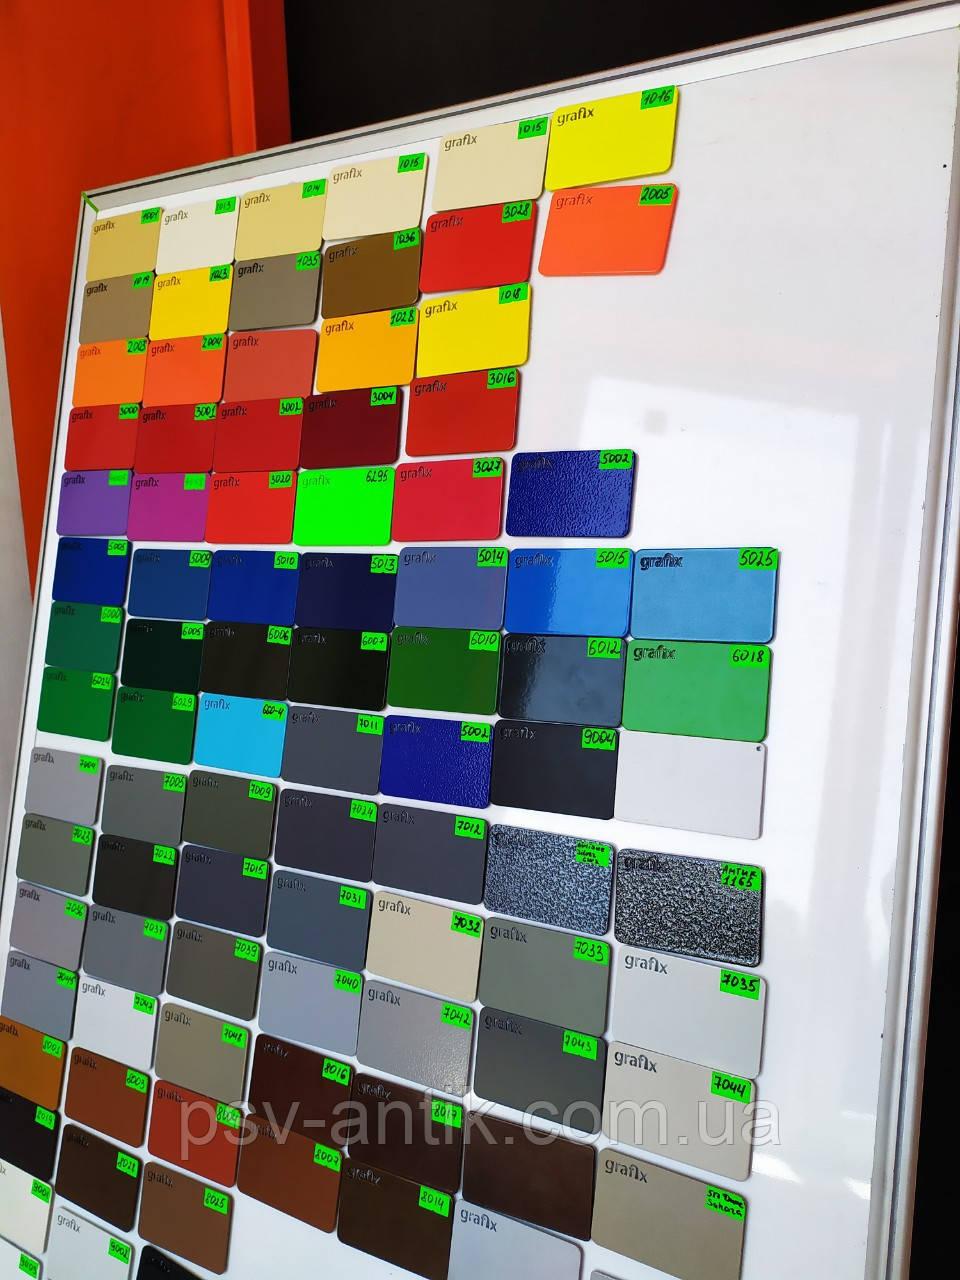 Порошковая краска глянцевая, полиэфирная, архитектурная, 6035